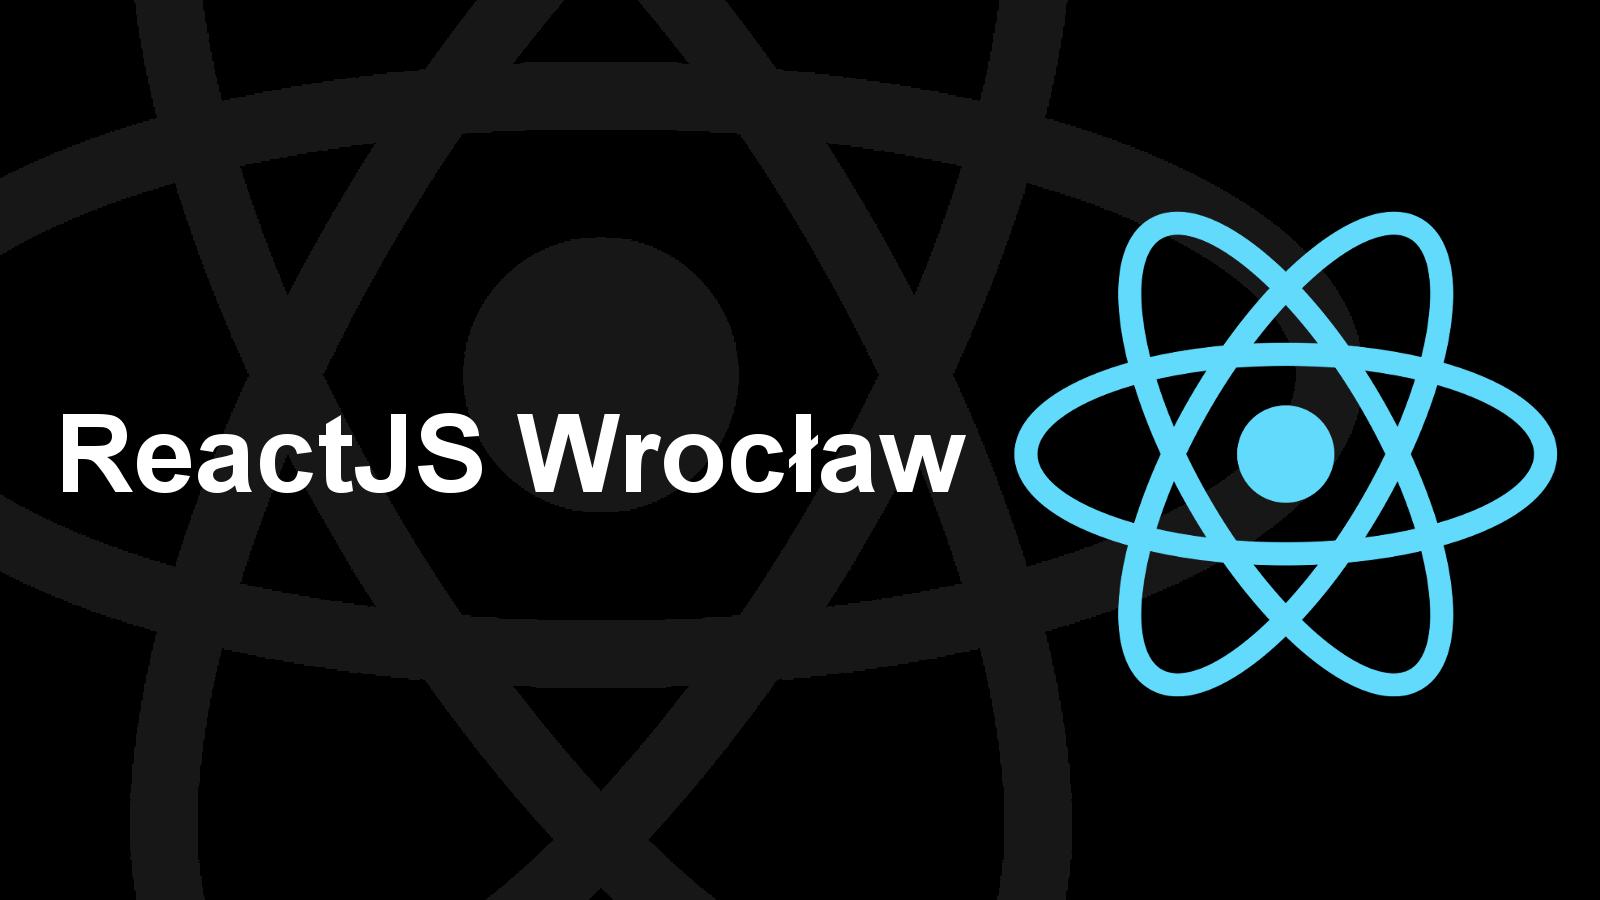 ReactJS Wrocław